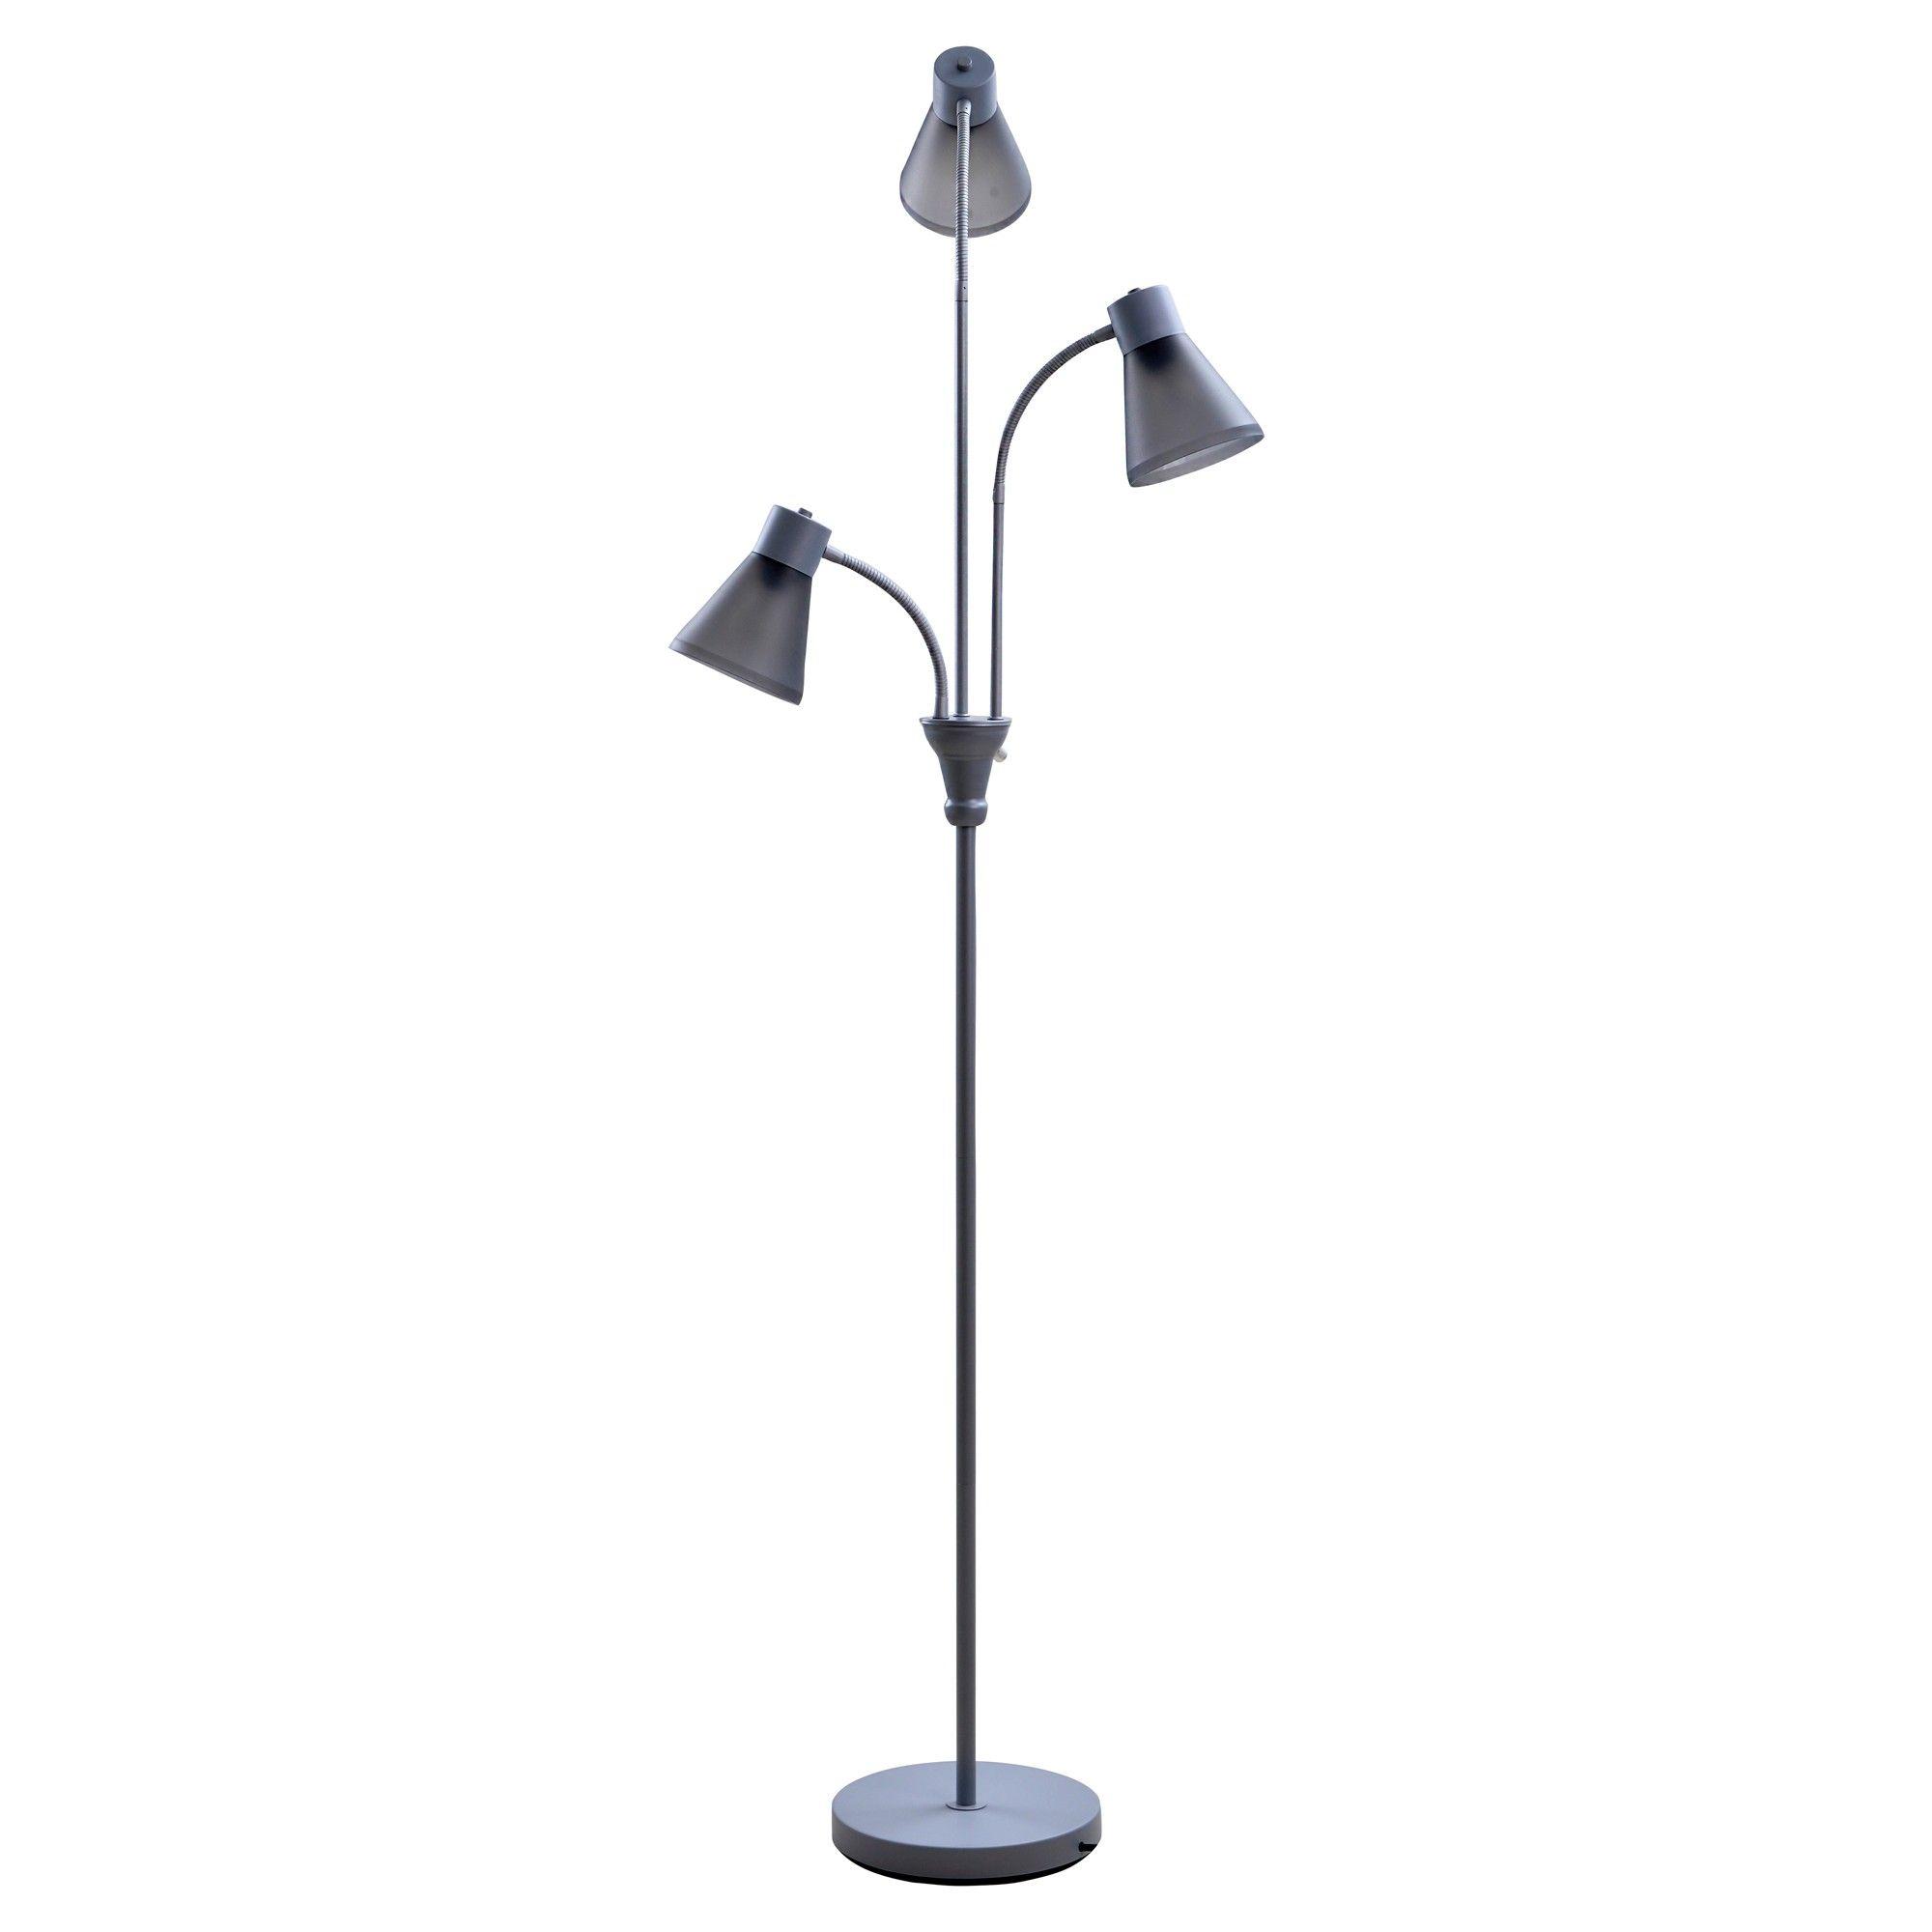 MultiHead Floor Lamp Gray Includes Energy Efficient Light